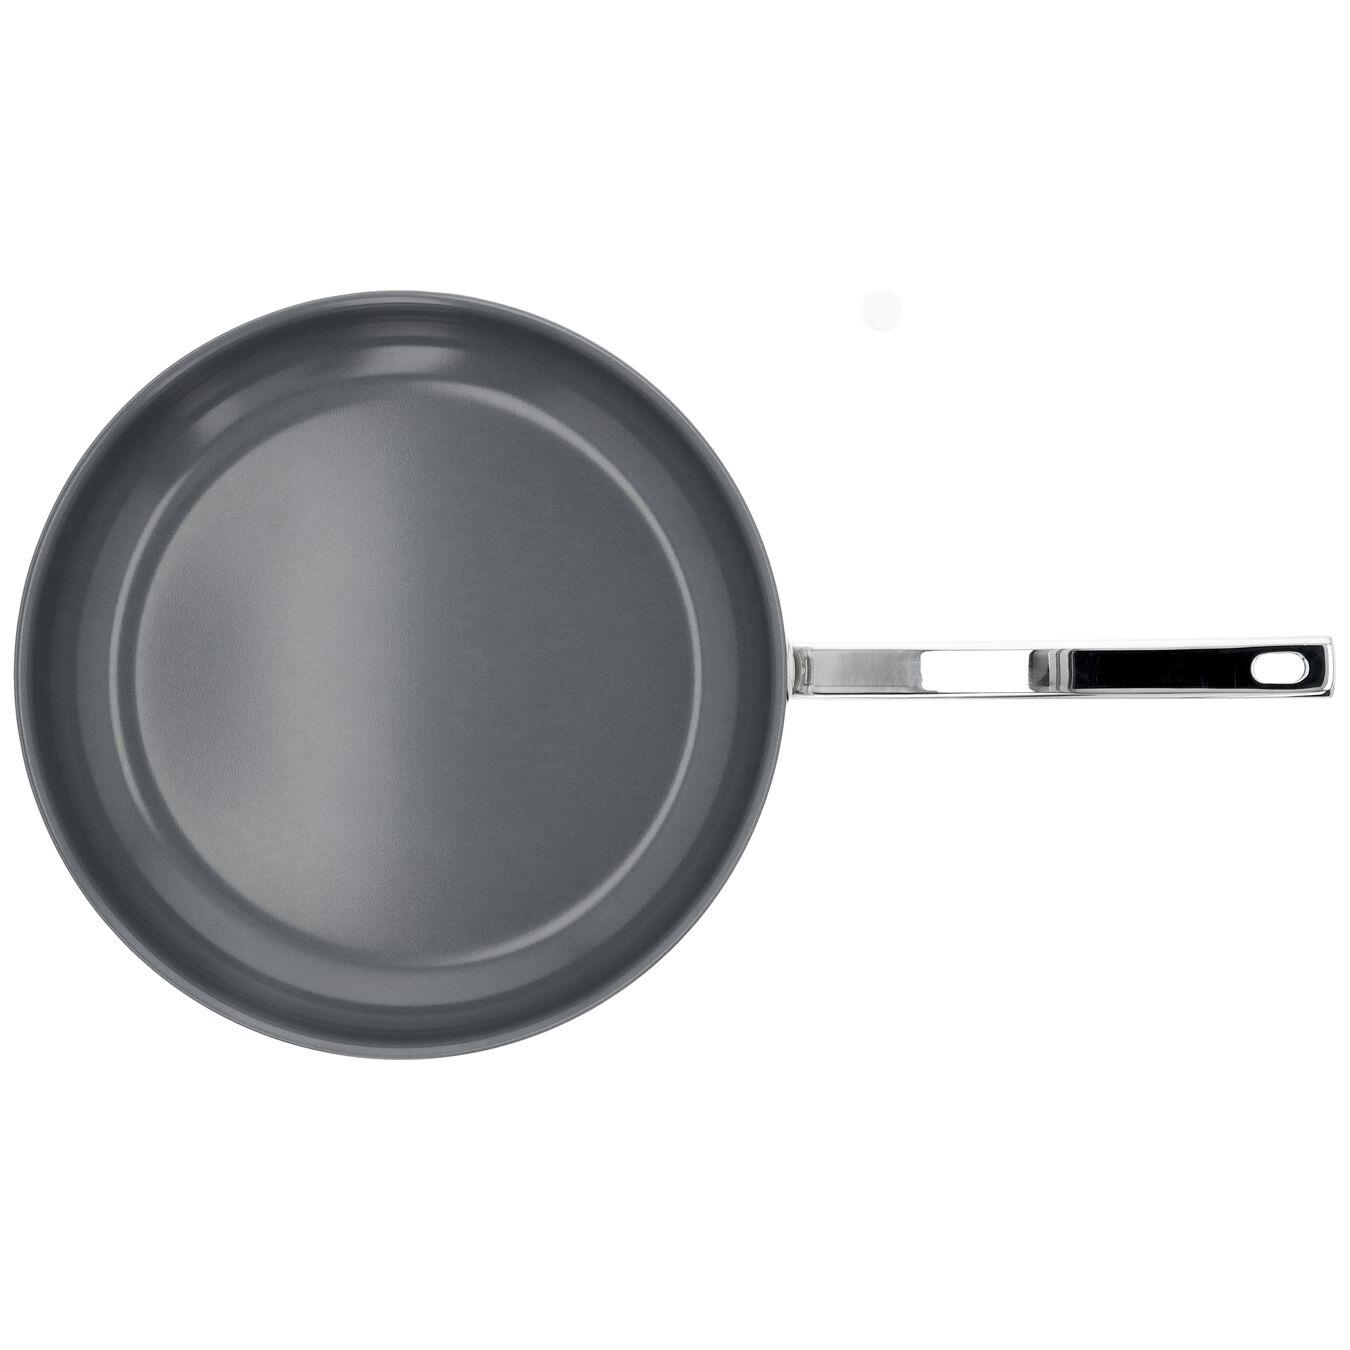 Stekpanna 32 cm, 18/10 Rostfritt stål, Silver,,large 4